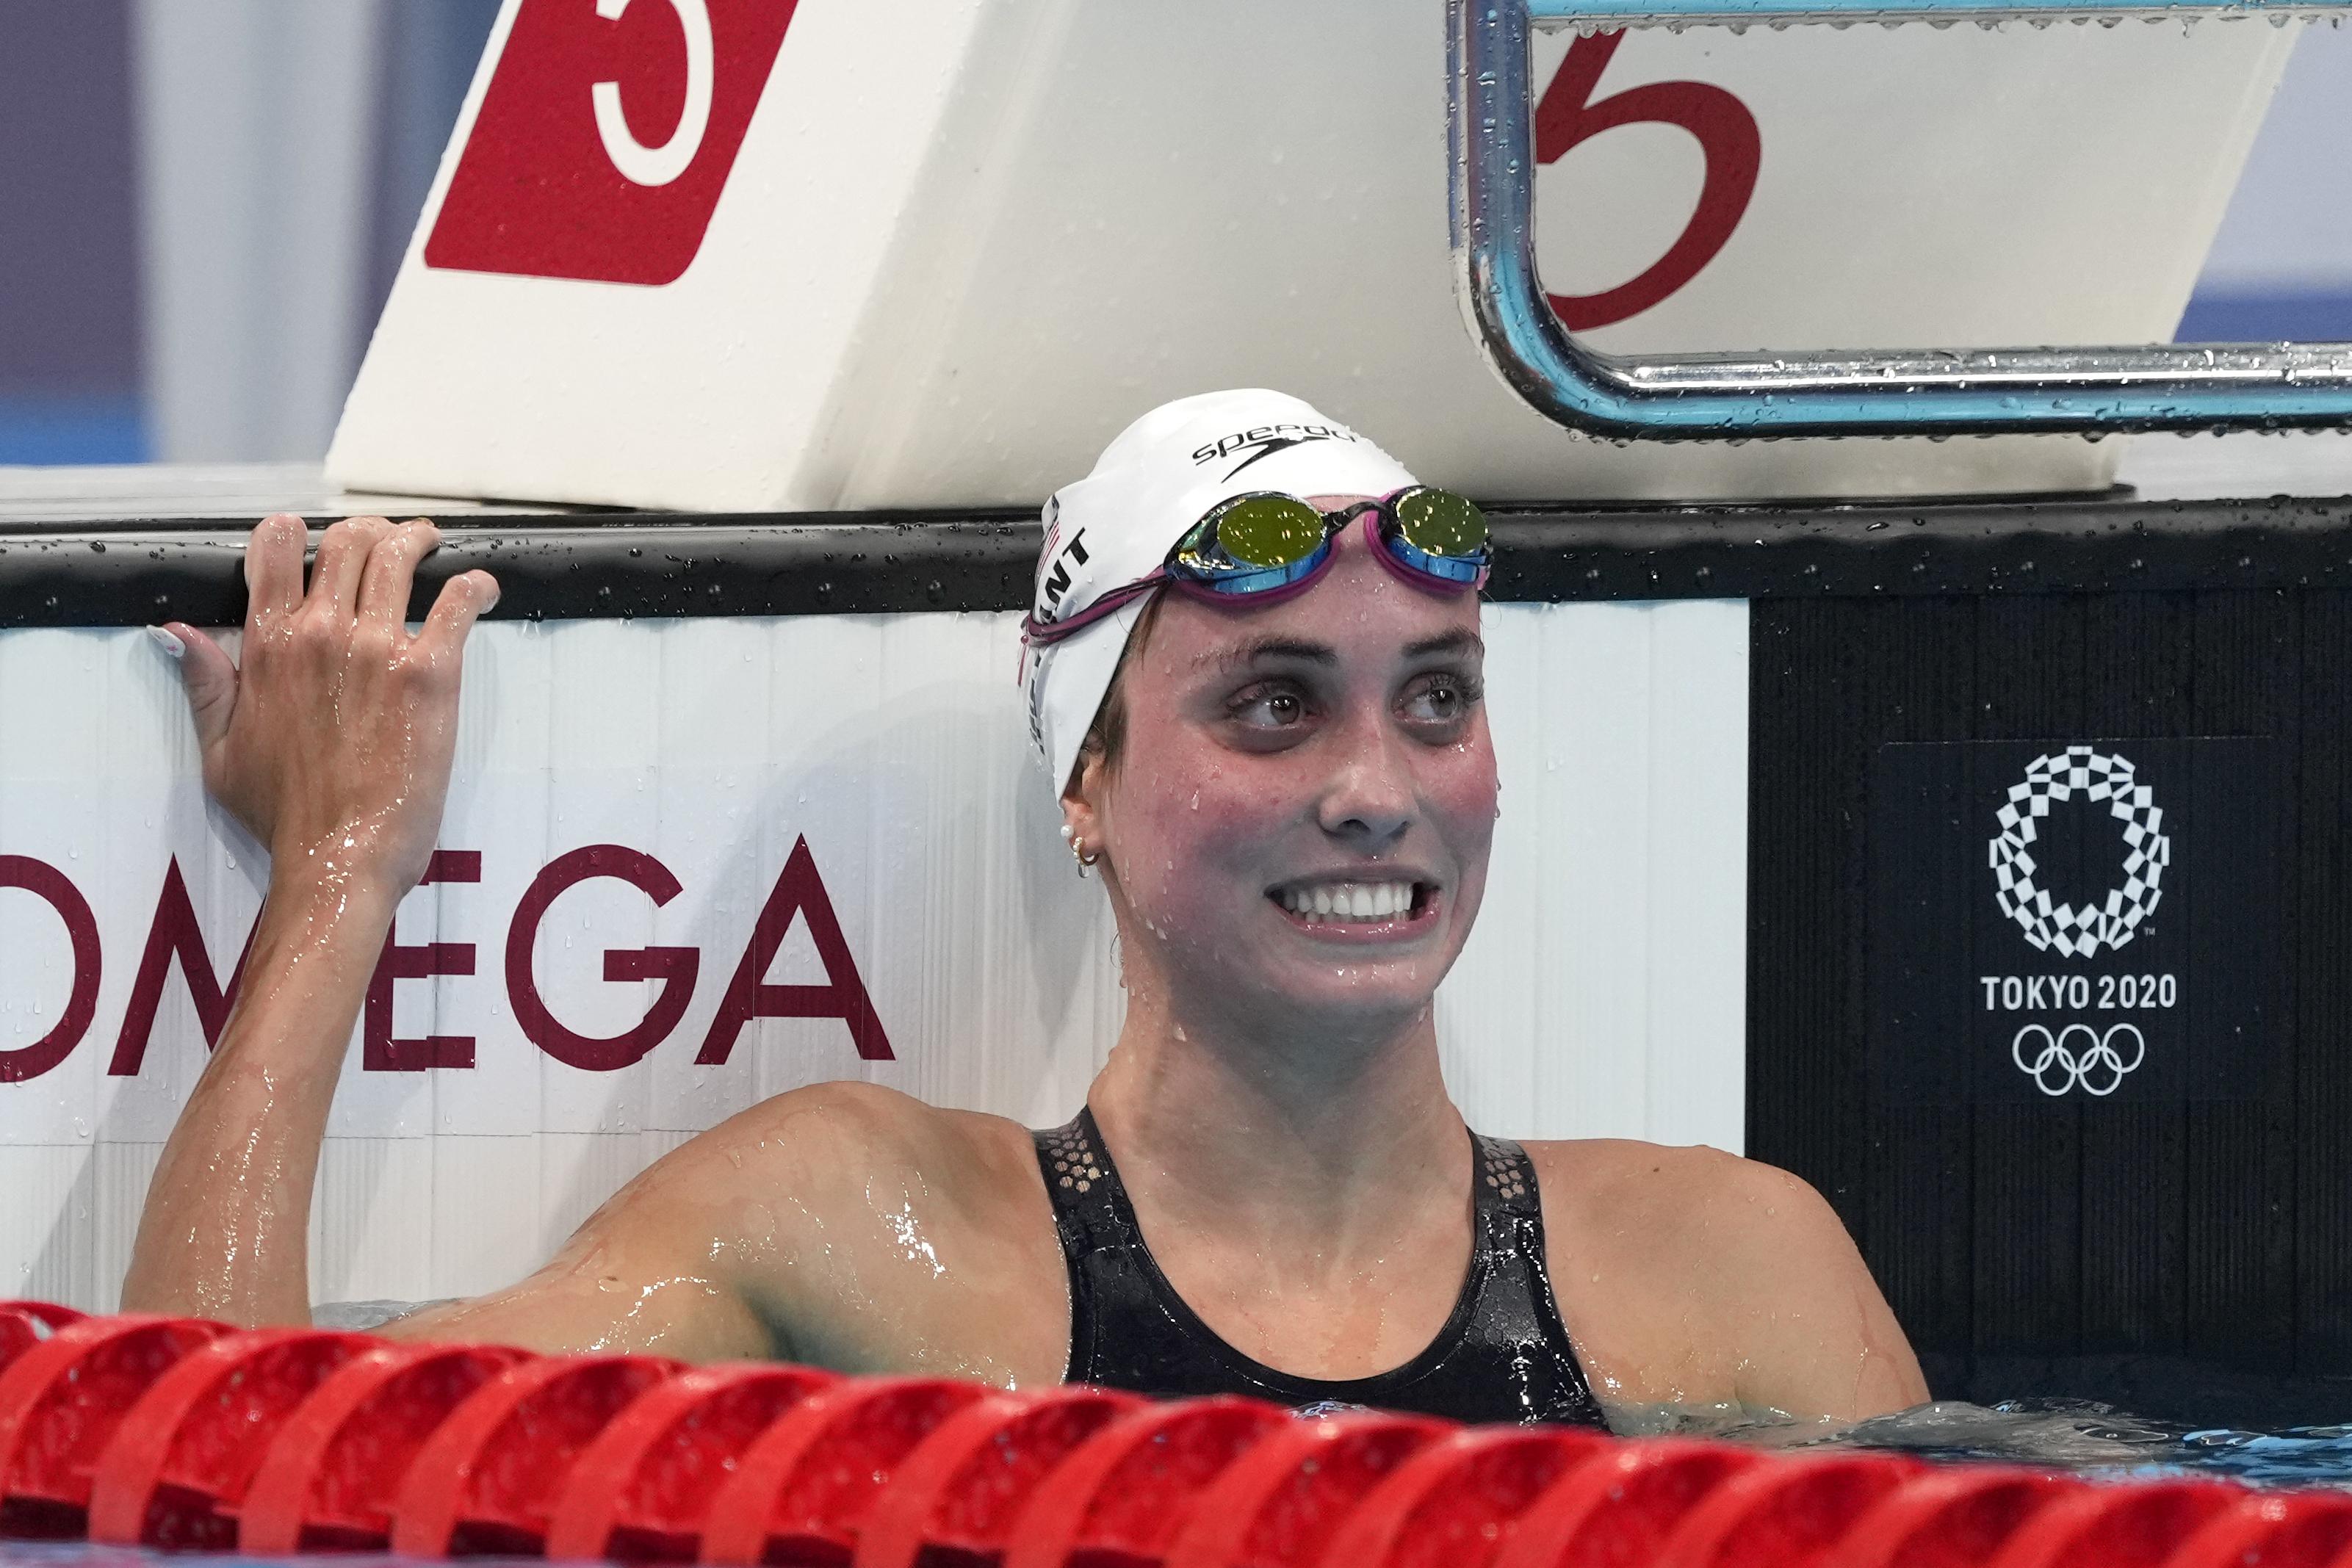 Sarasota Olympian Swimmer Emma Weyant Finishes 2nd In 400m Individual Medley Wfla